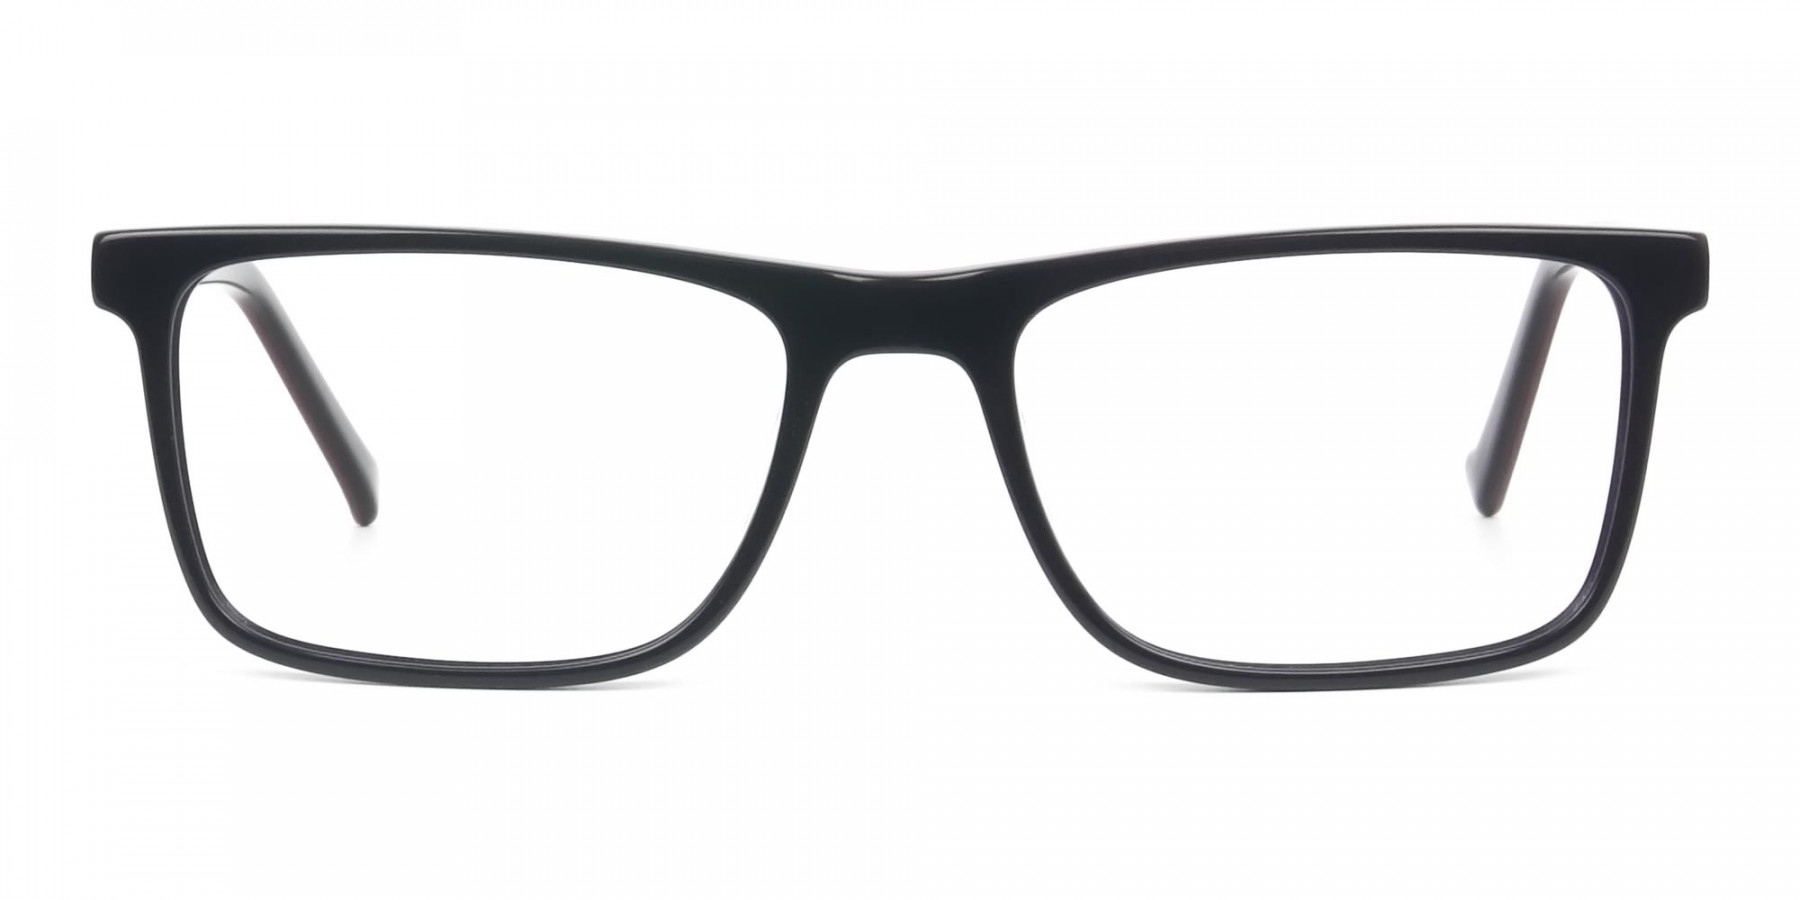 Round Temple Tip Red & Purple Eyeglasses in Rectangular  - 1